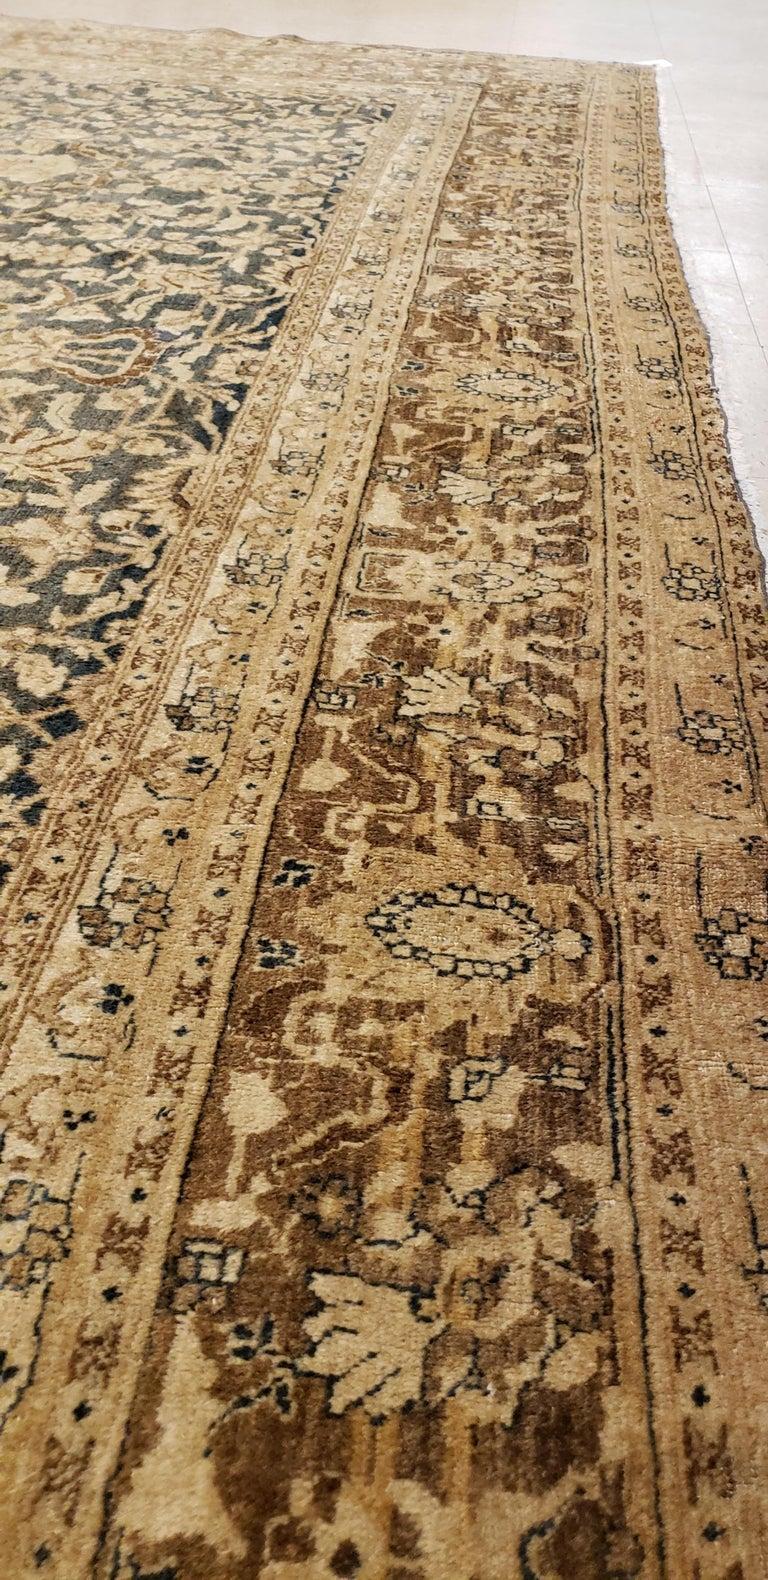 Antique Persian Tabriz Carpet, Handmade Oriental Rug, Beige, Gray/Blue, Taupe For Sale 1